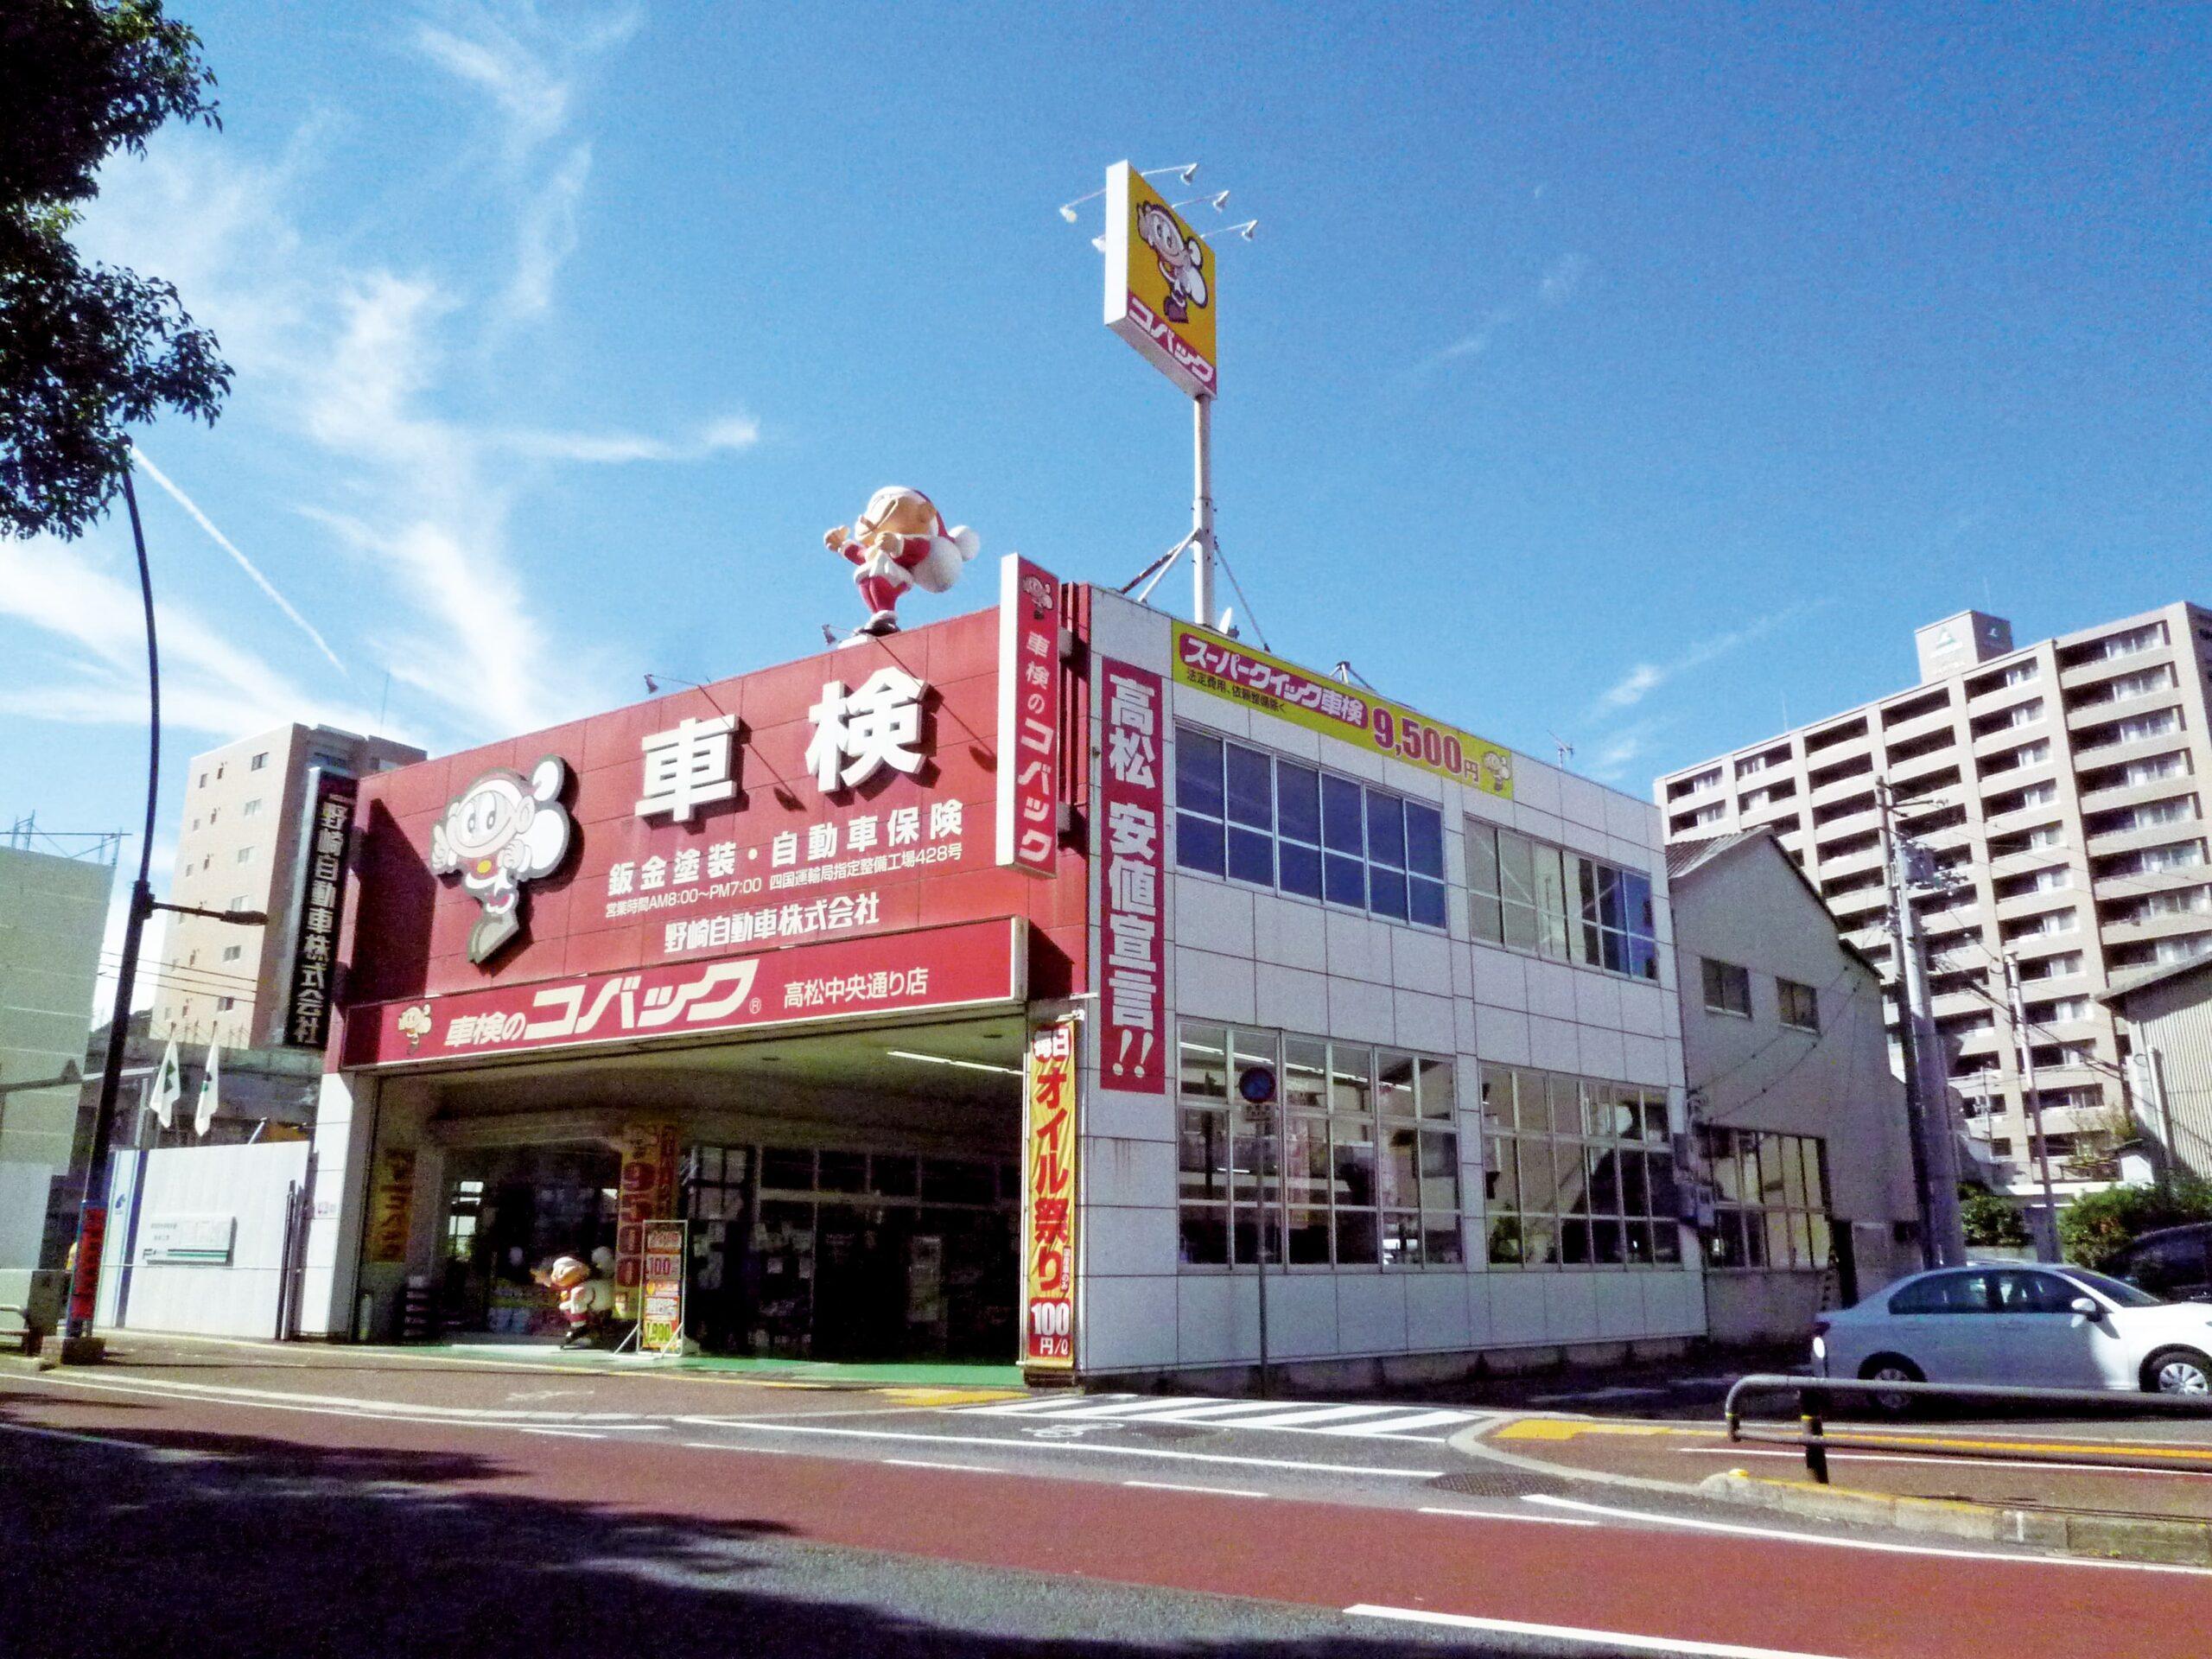 https://course-kagawa.com/wp-content/uploads/2021/03/2021野崎自動車00007-scaled.jpg